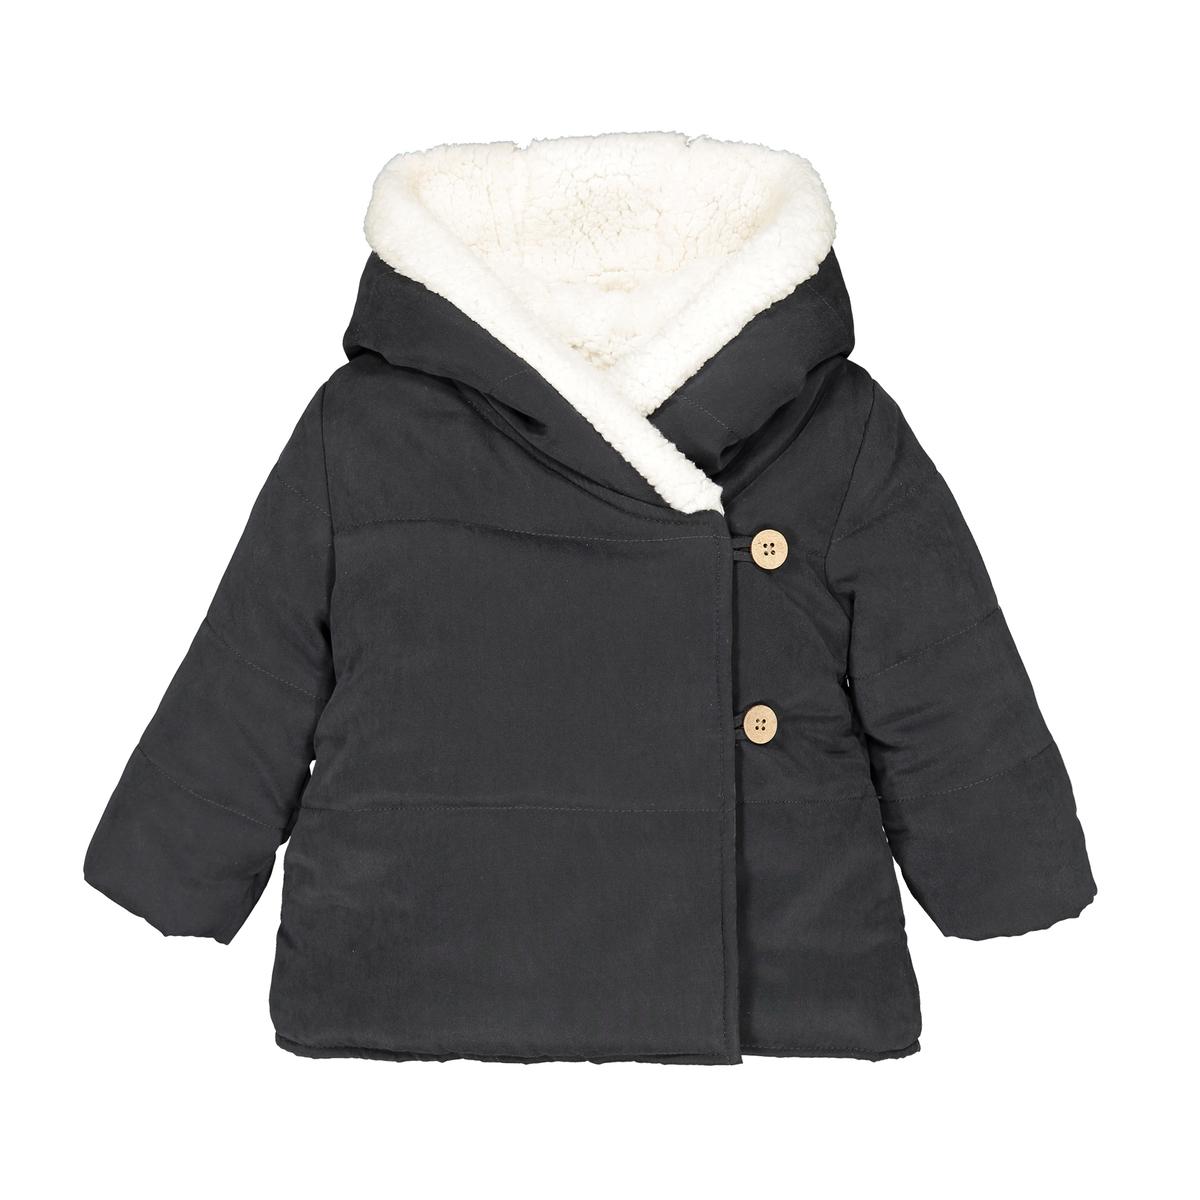 Утепленная La Redoute Куртка с капюшоном мес- года 1 мес. - 54 см серый куртка утепленная 7689 1